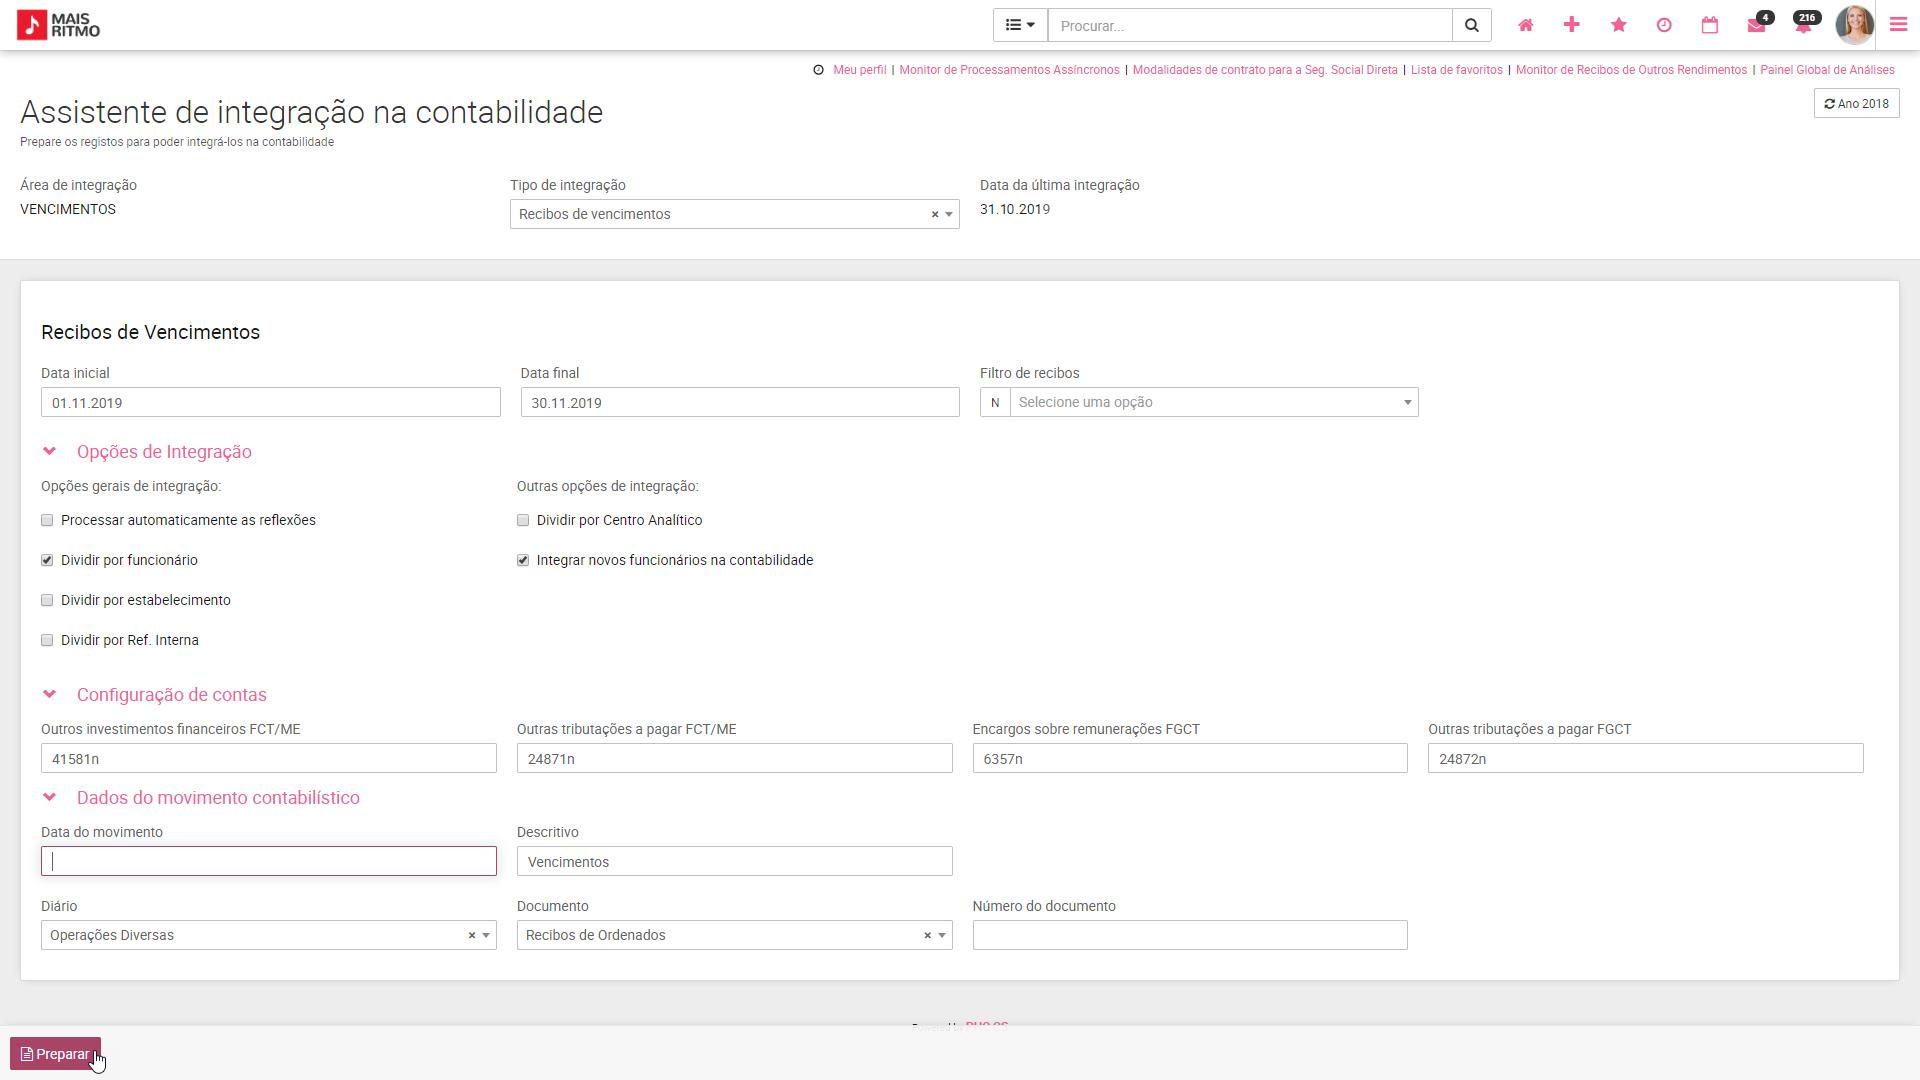 Monitor_Assistente_Integracoes_Contabilidade_vencimentos_web3